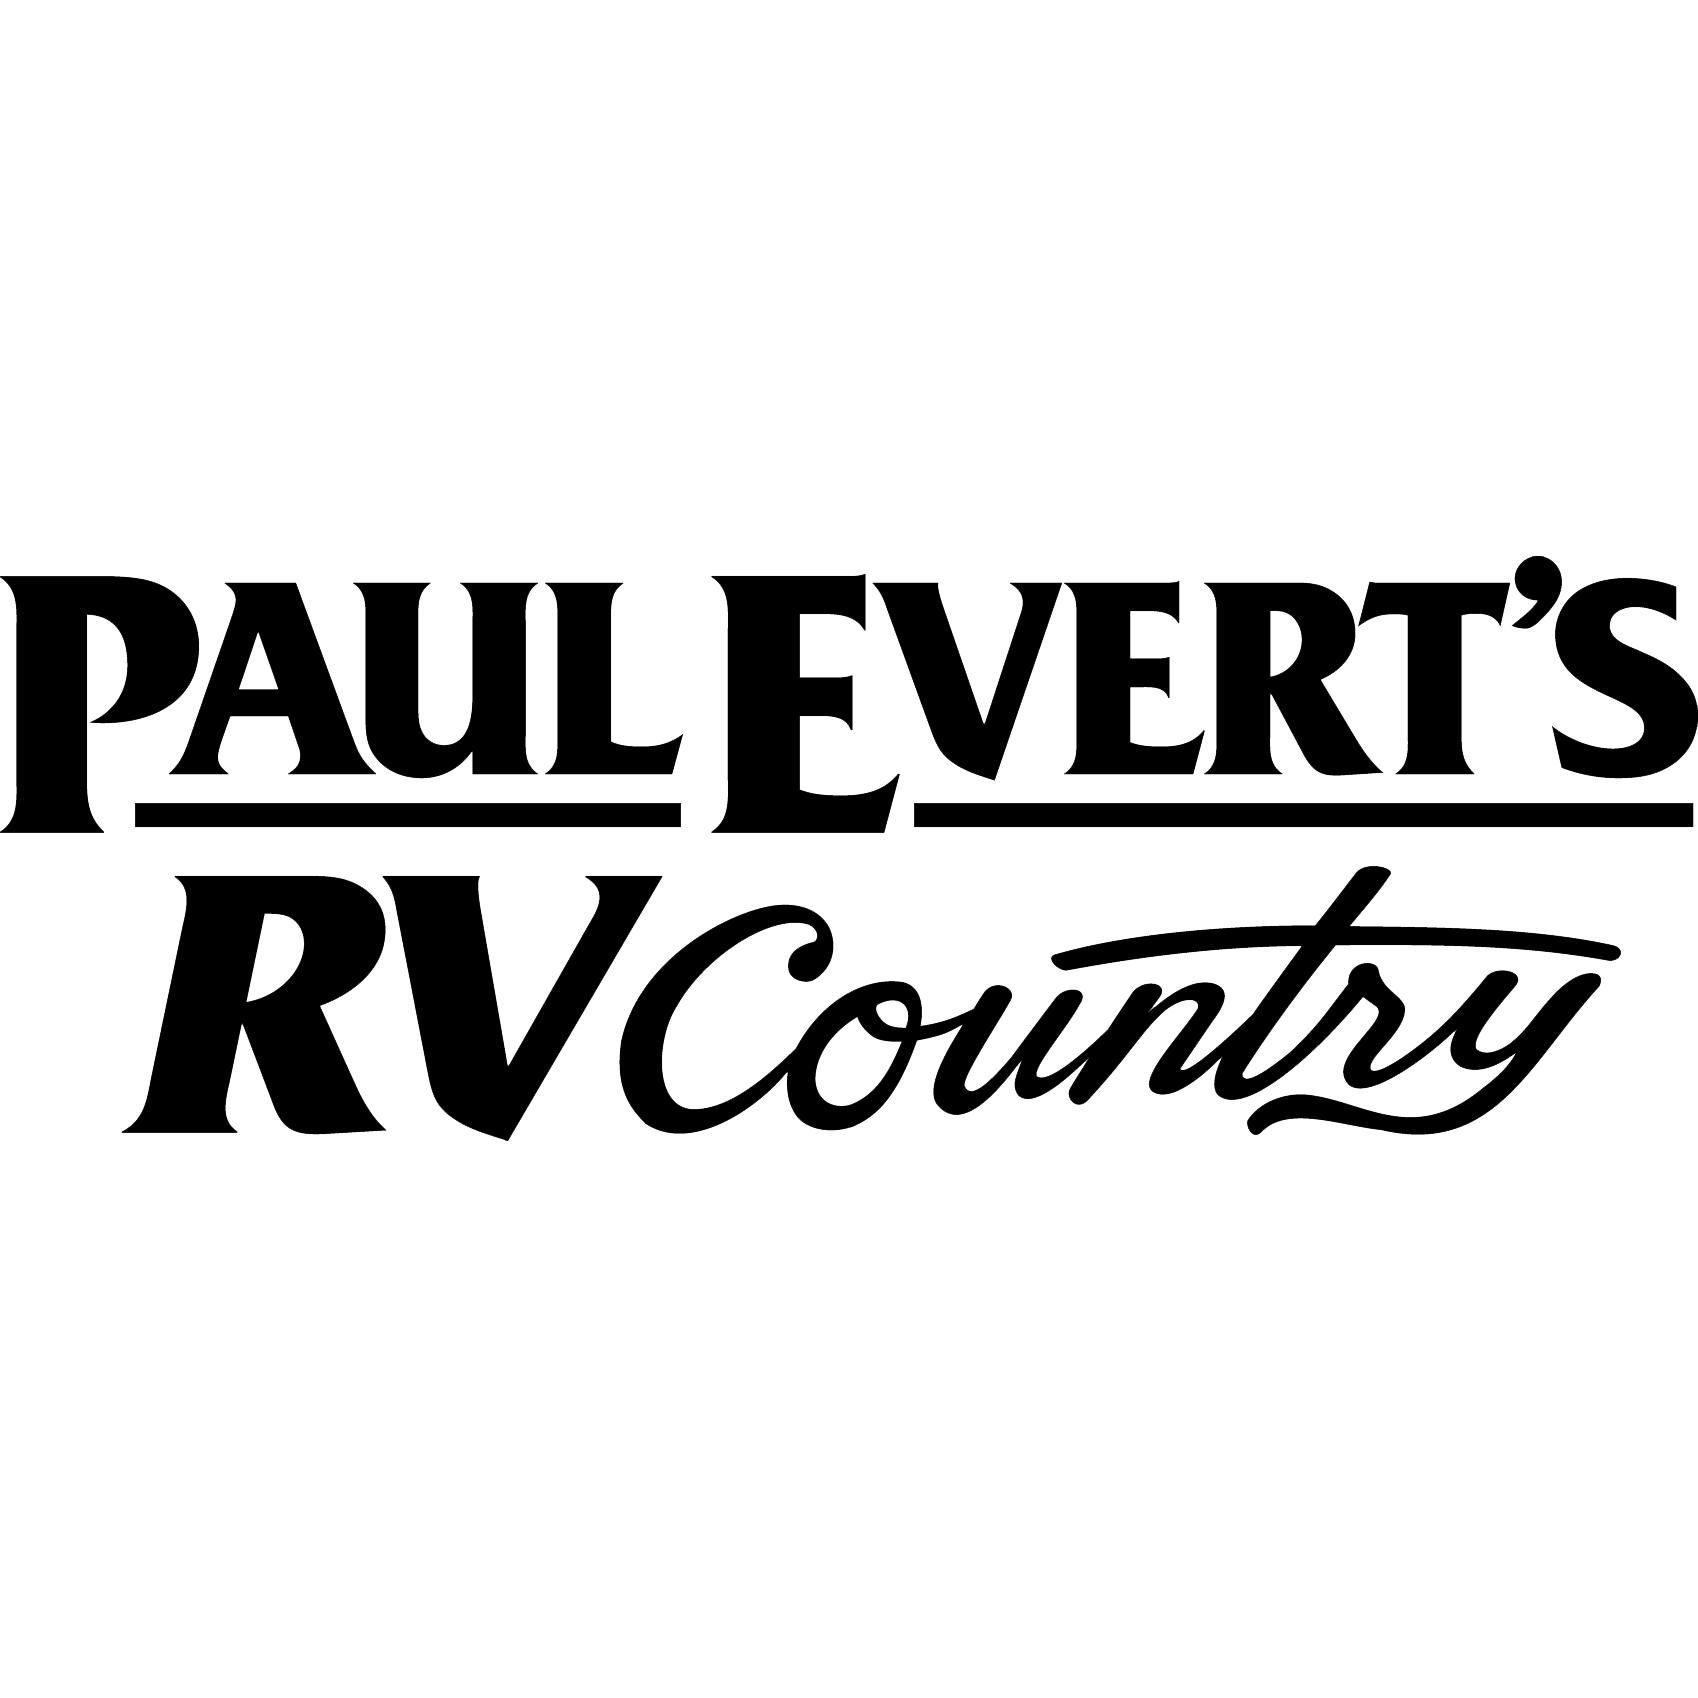 Paul Evert RV Country - Bullhead - Bullhead City, AZ - Sporting Goods Stores